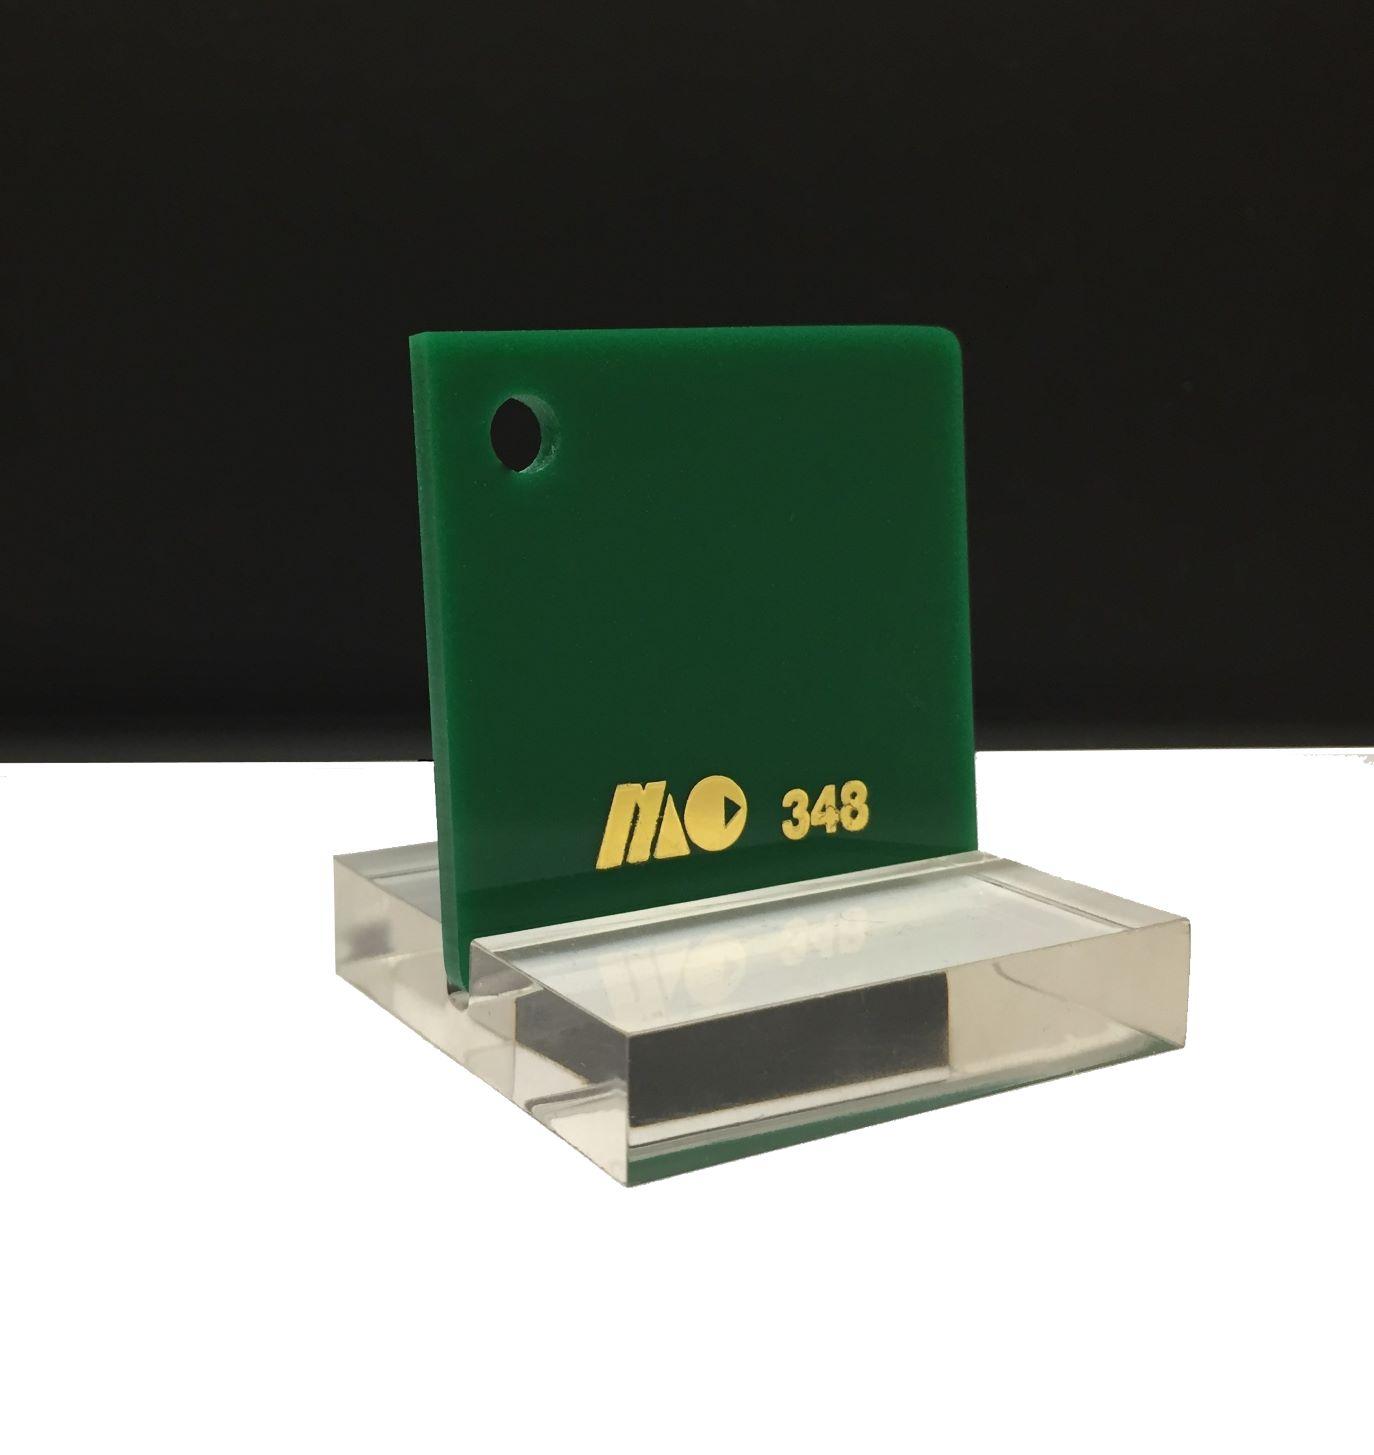 MC 348